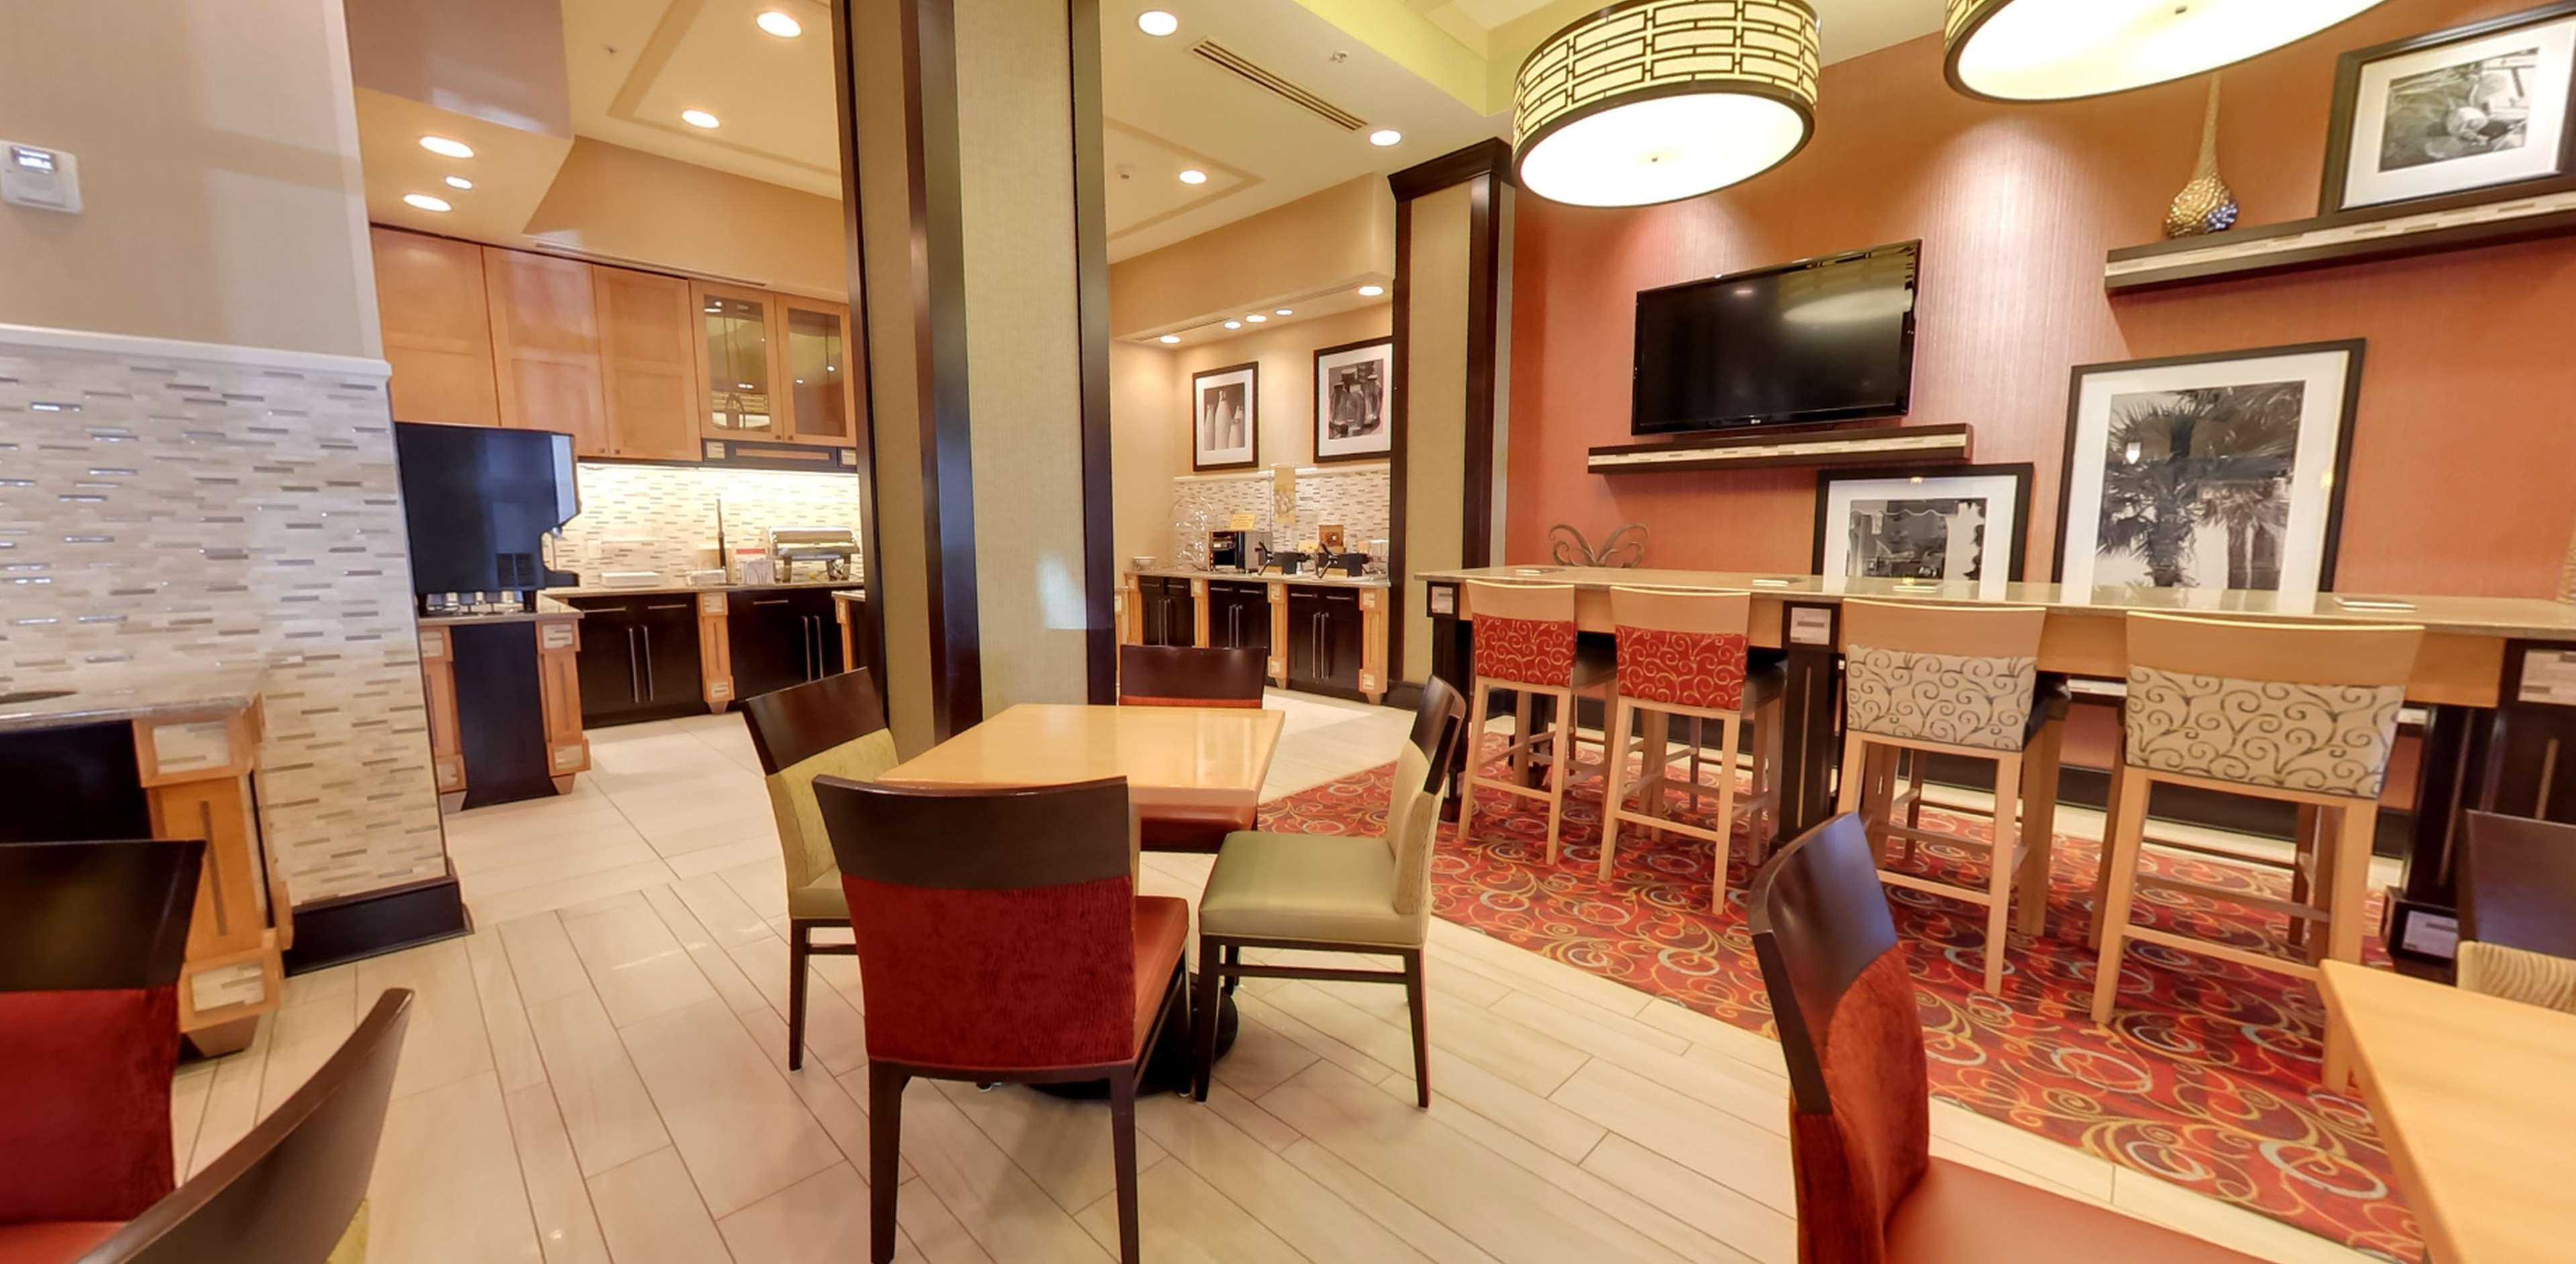 Hampton Inn & Suites St. Petersburg/Downtown image 7